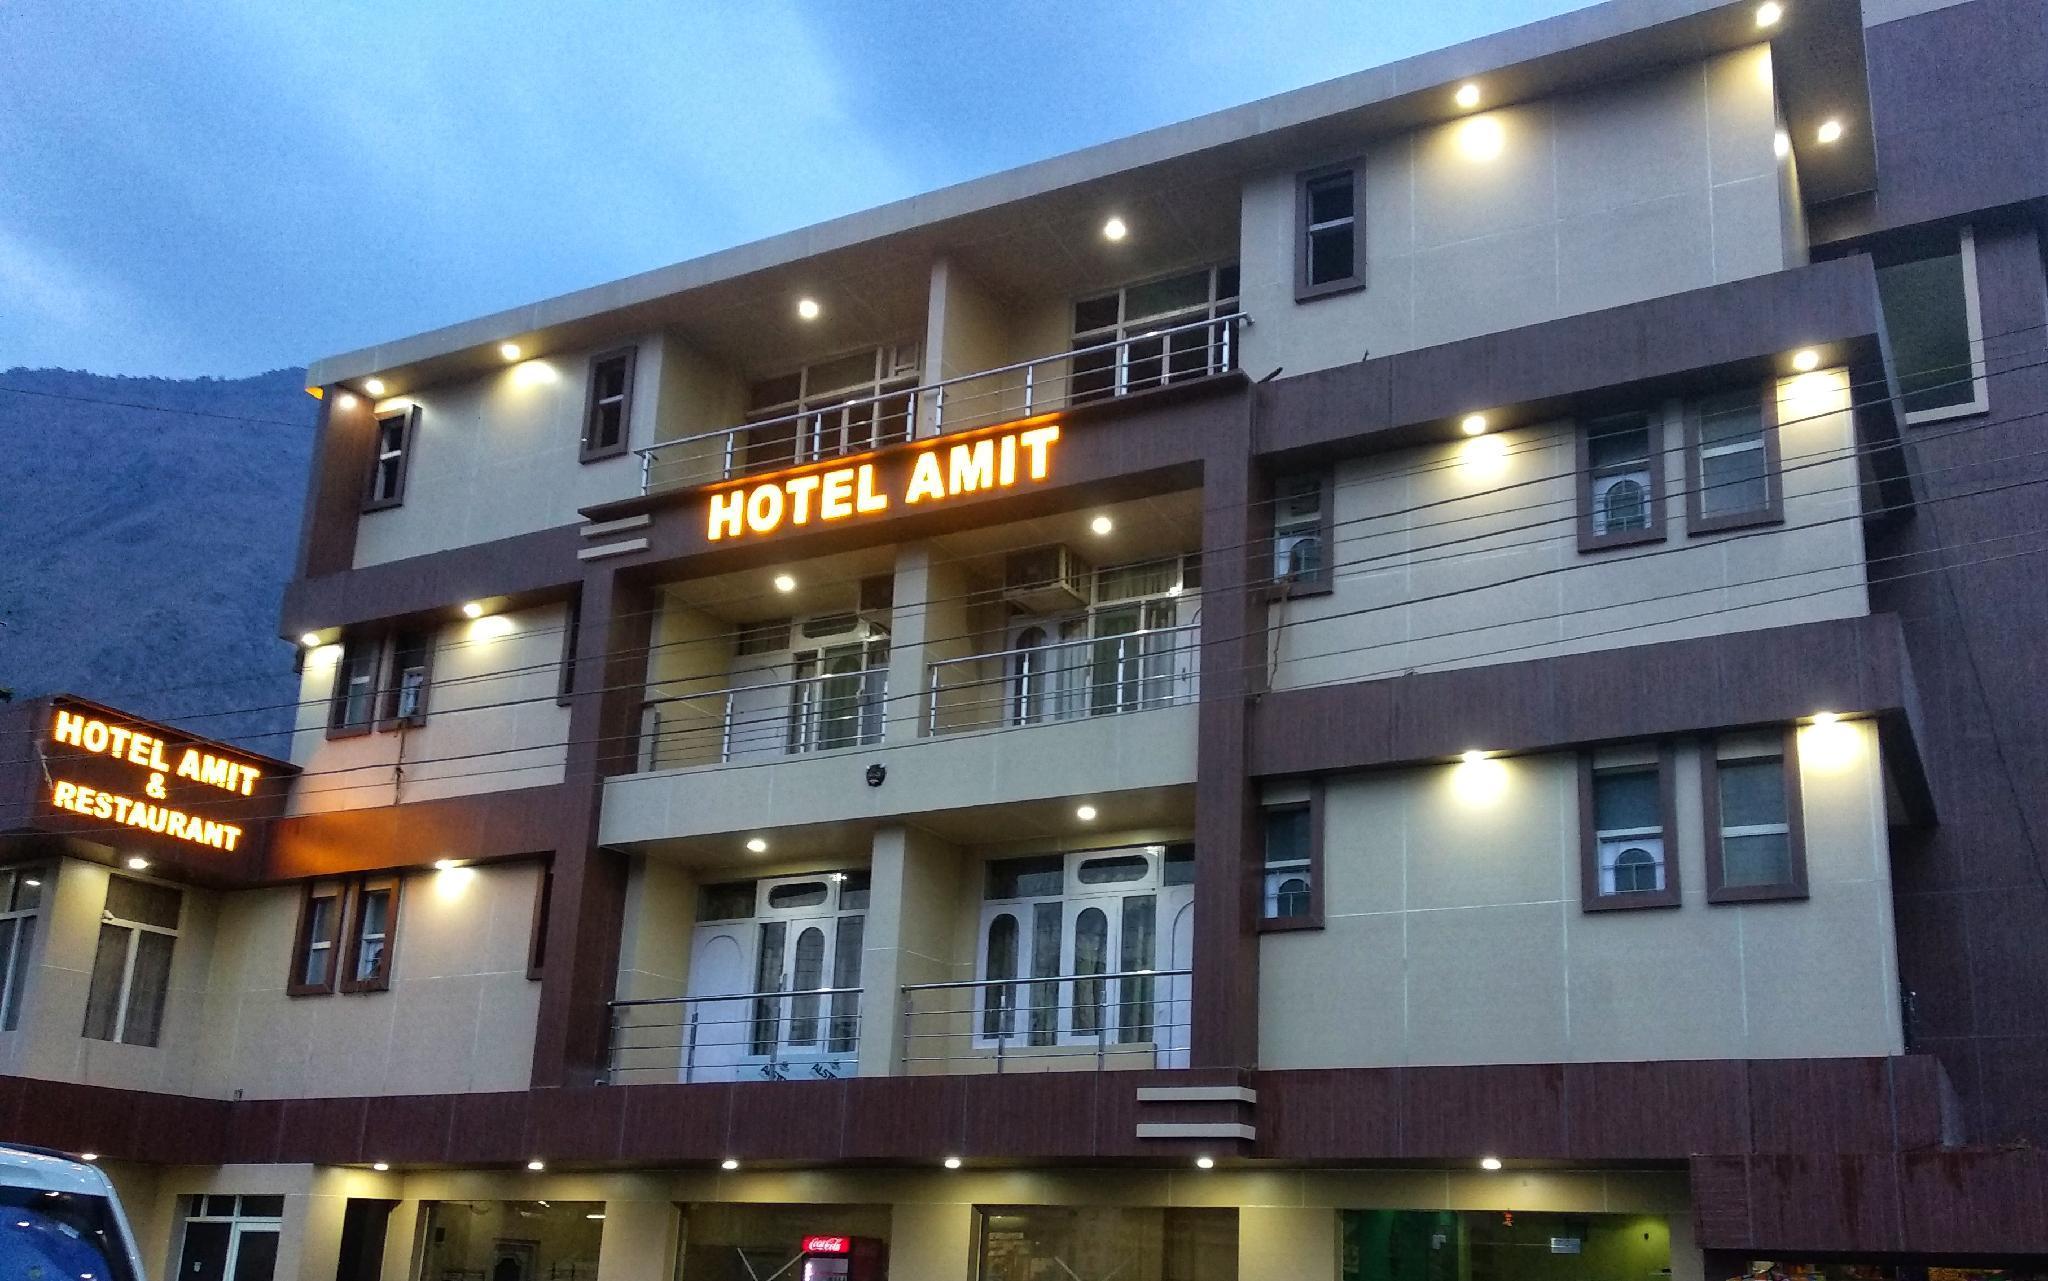 Hotel Amit